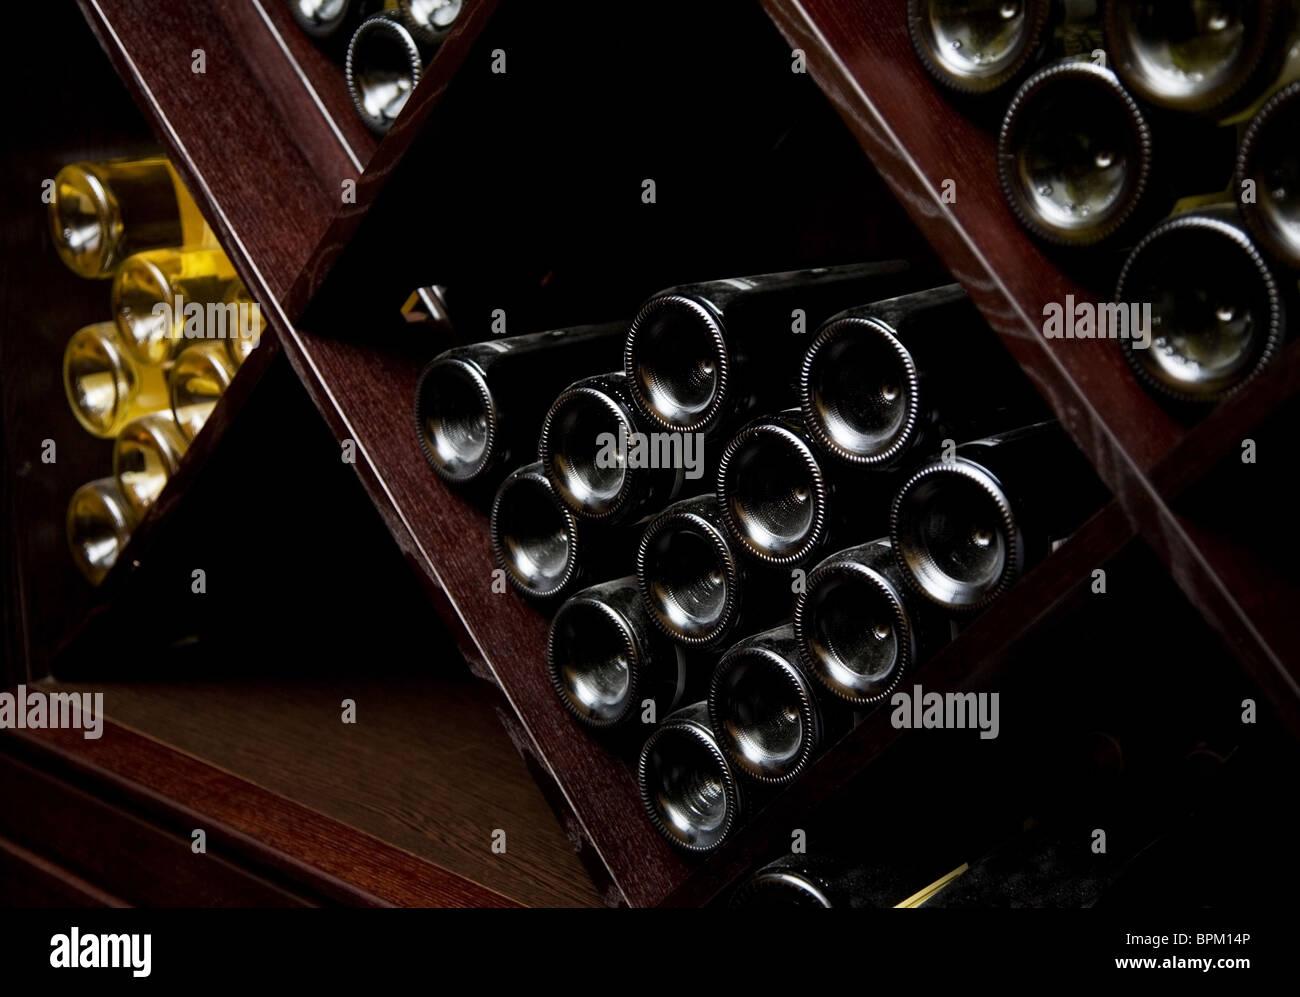 Snapshot of the wine cellar. The bottles on wooden shelves. - Stock Image